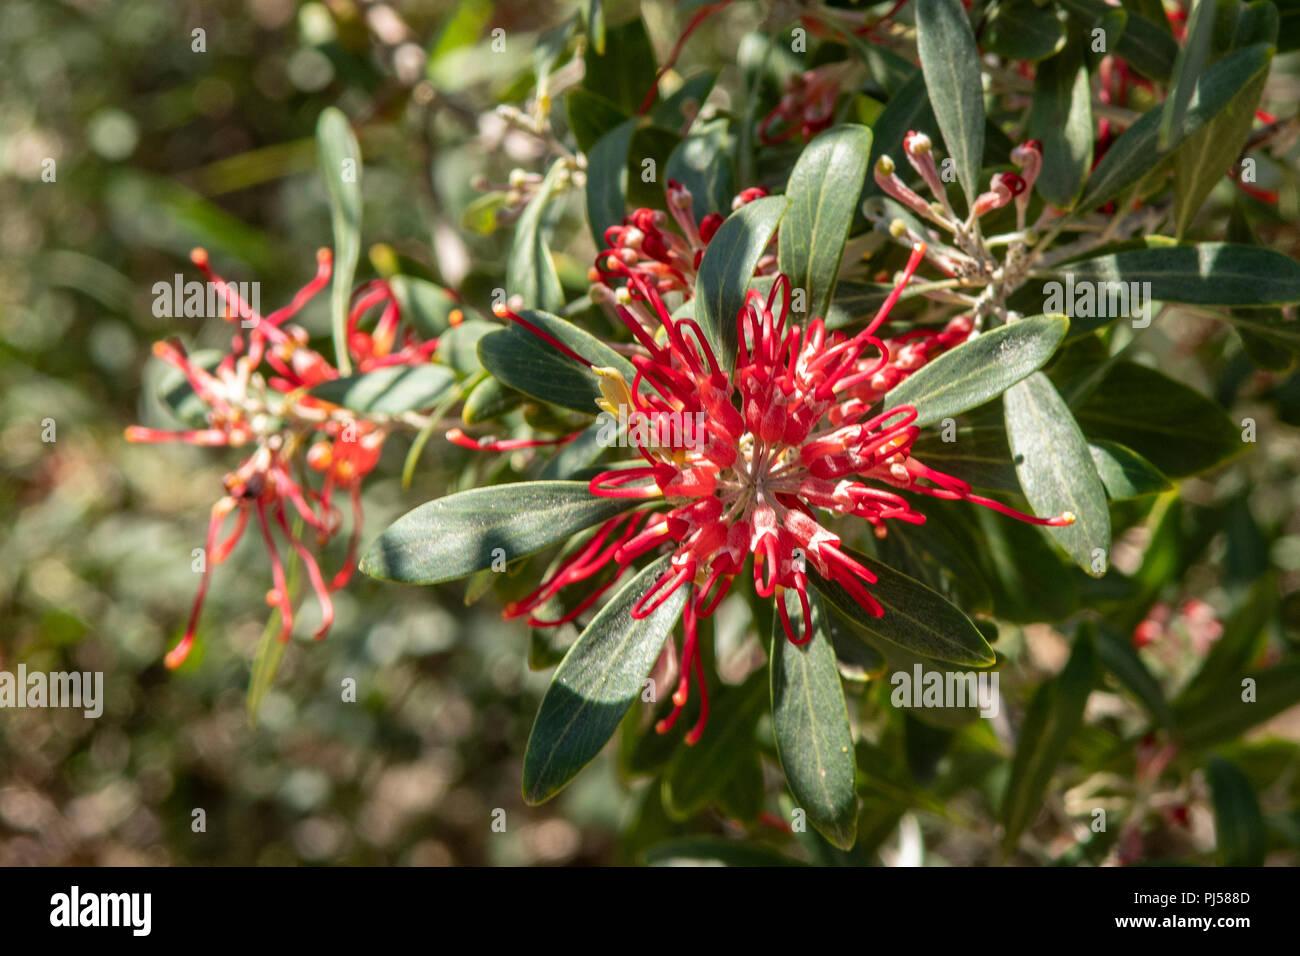 Grevillea olivacea, Olive Grevillea - Stock Image